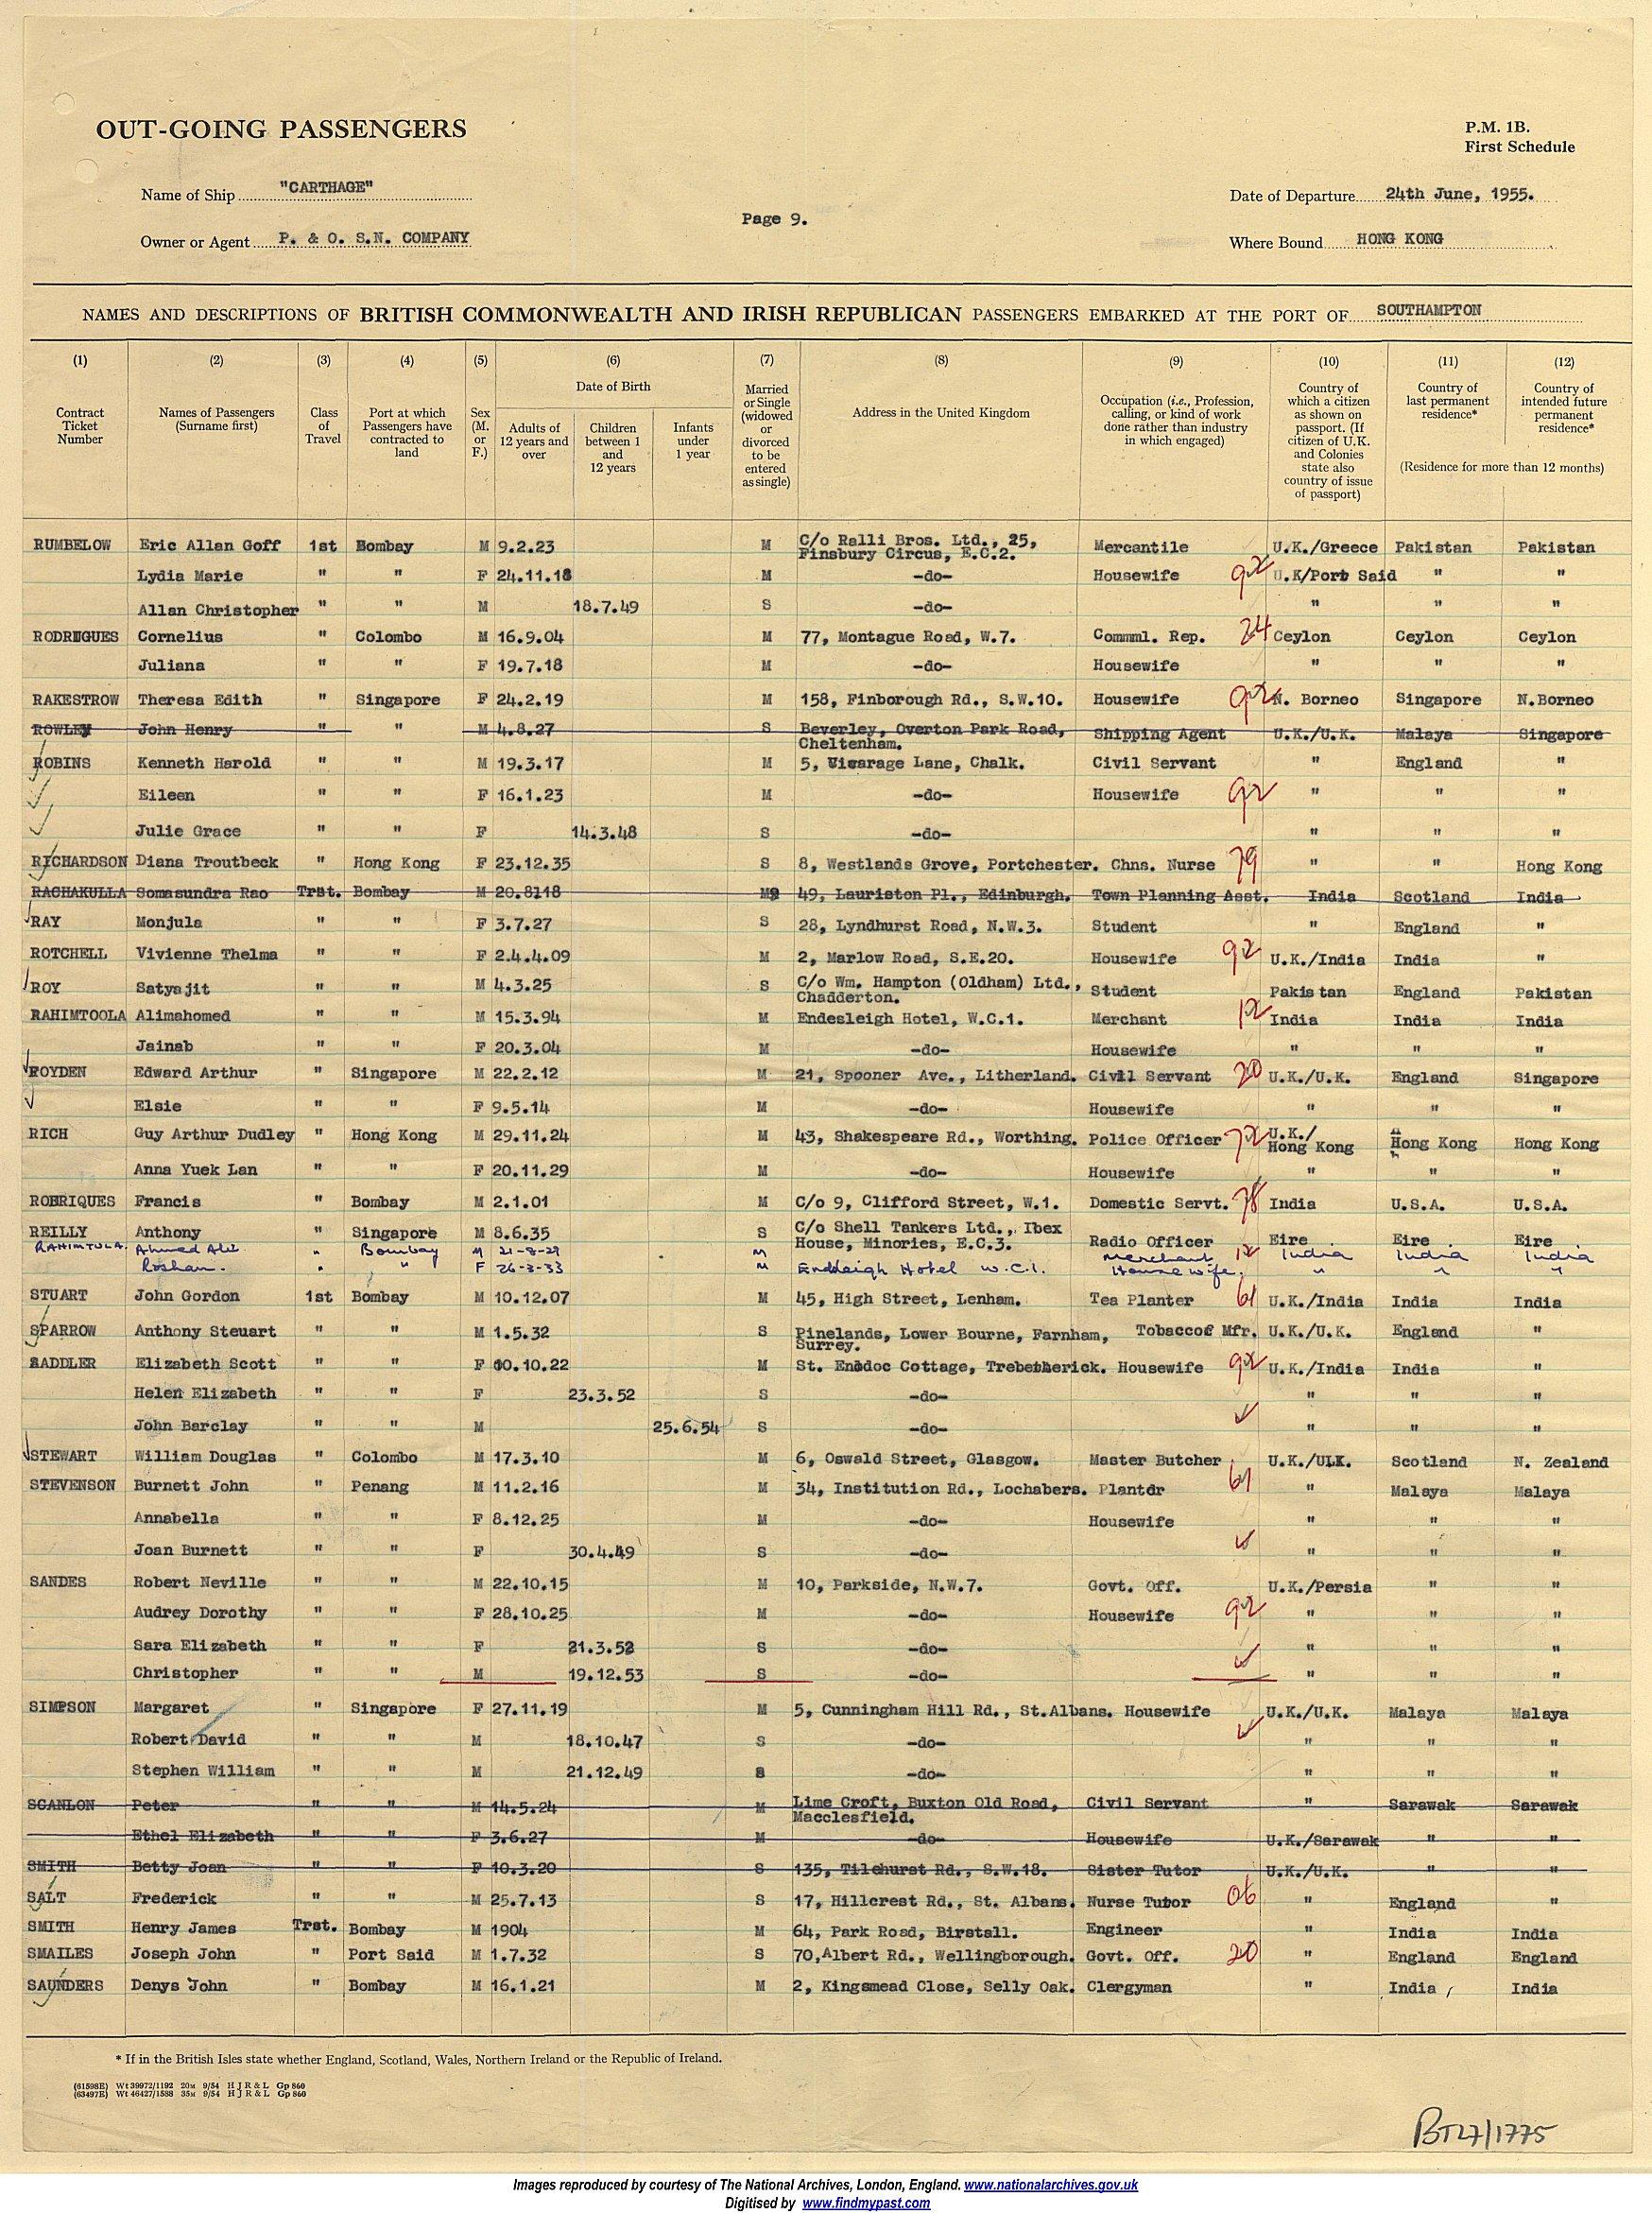 Passenger list Southampton to Hong Kong 24 June 1955